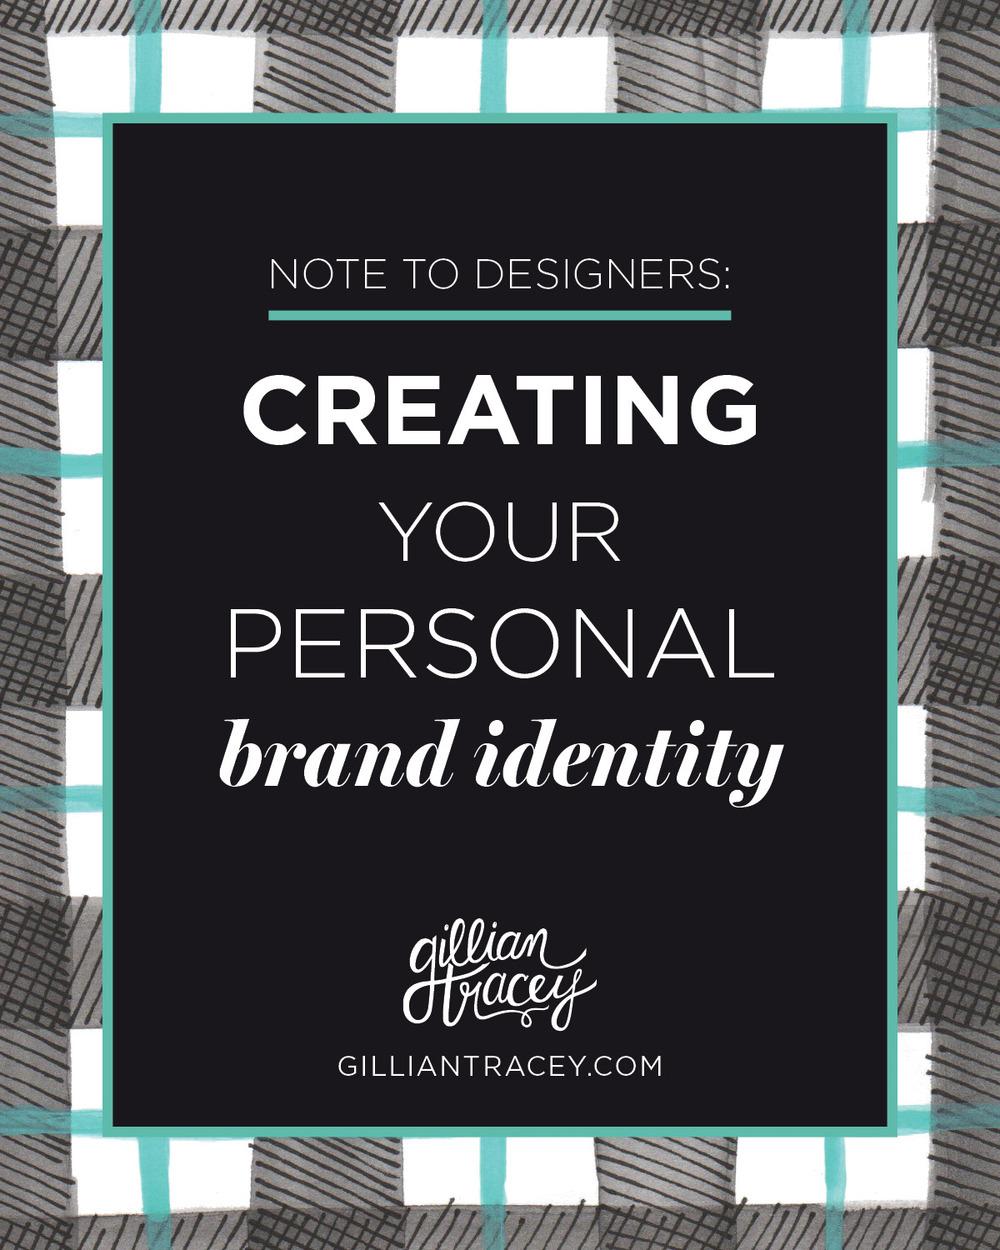 Gillian Tracey Design Blog